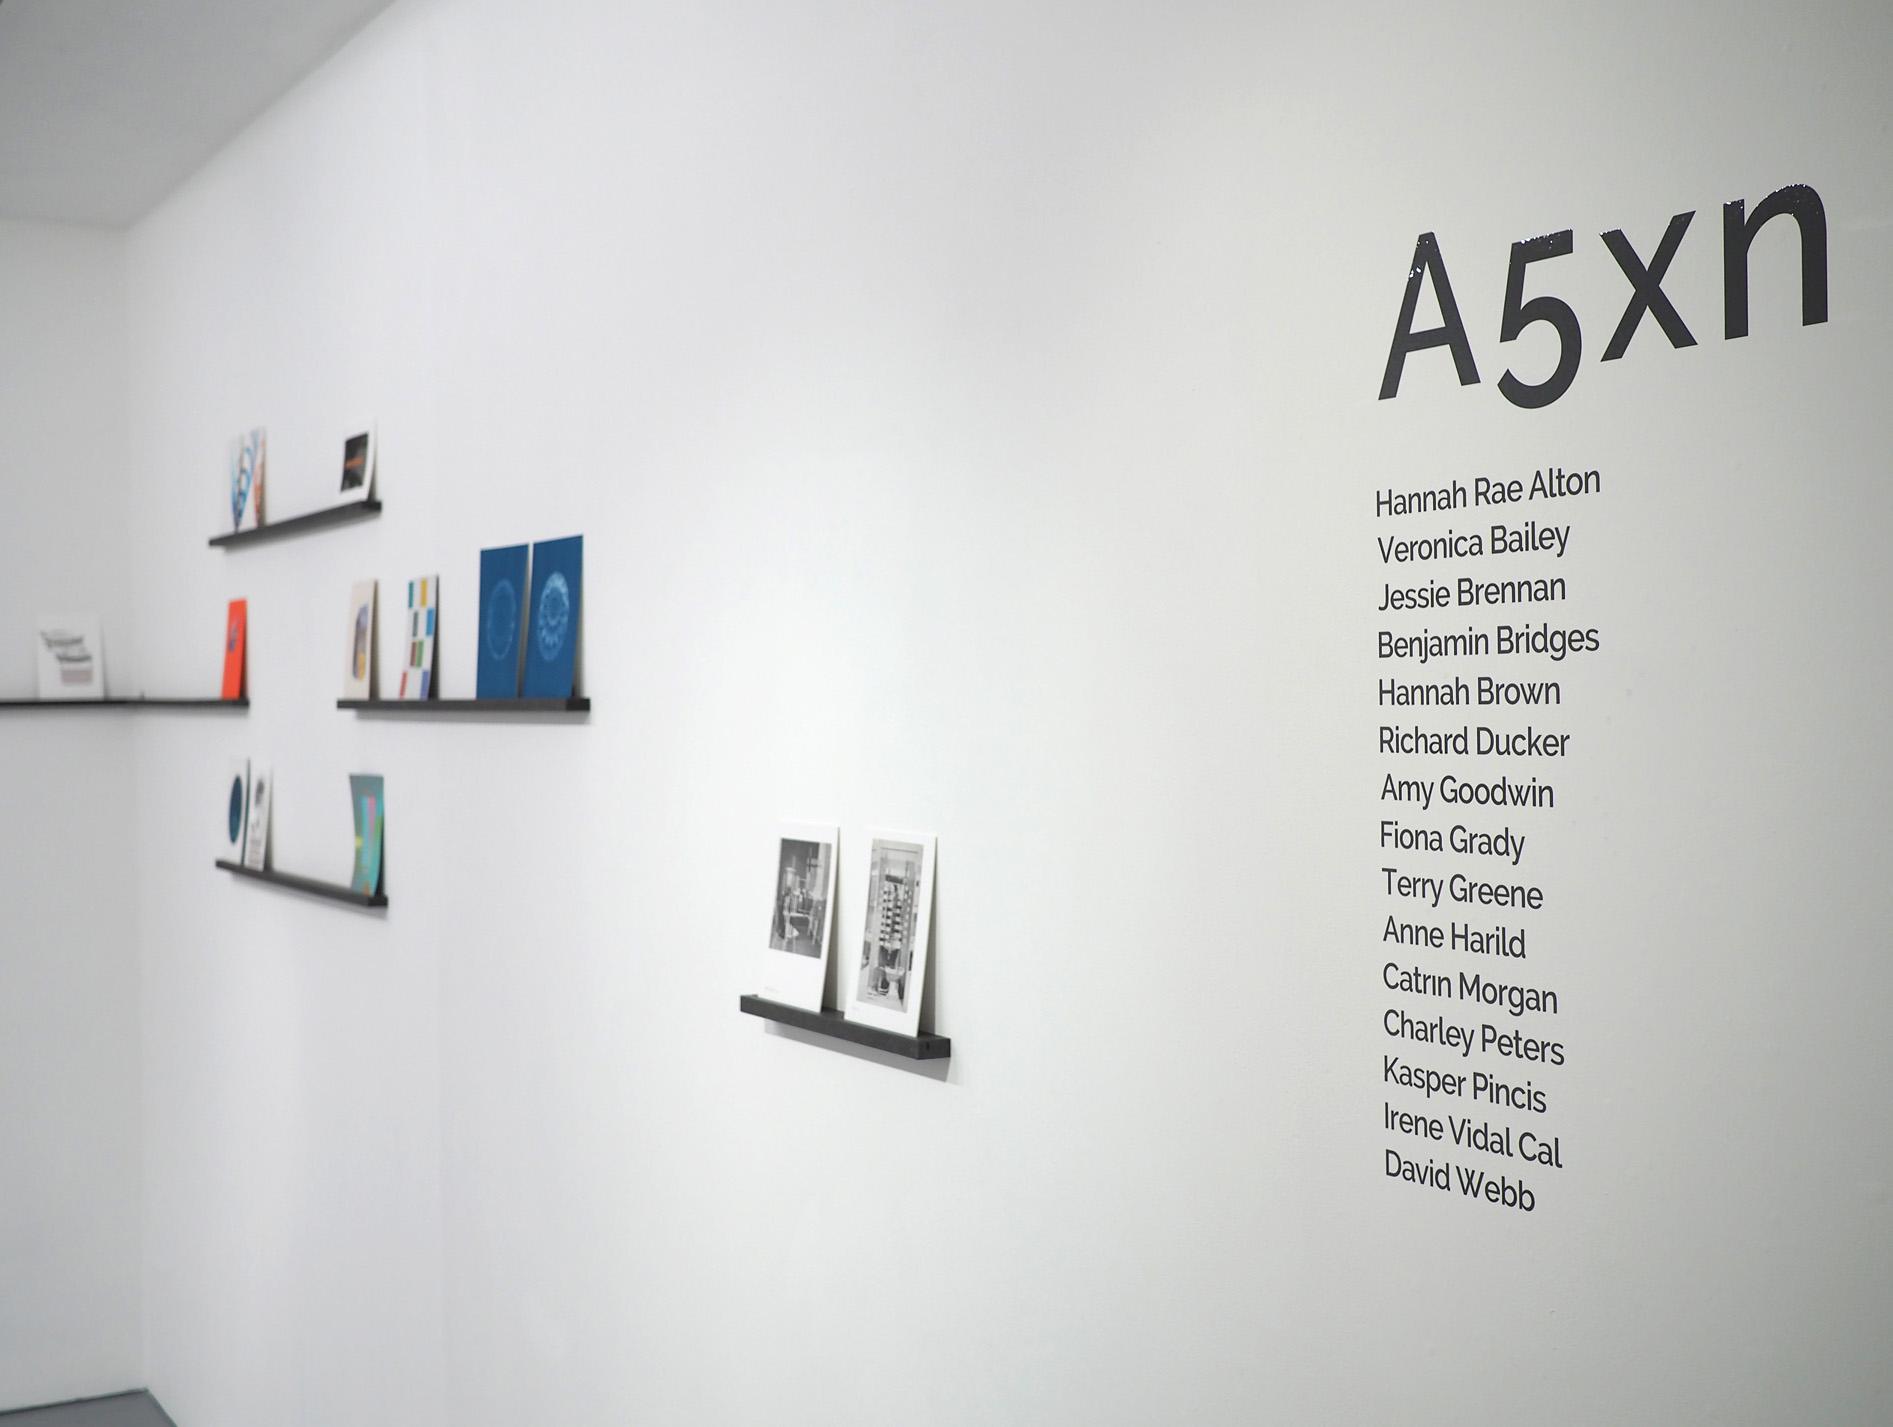 A5xn installation view